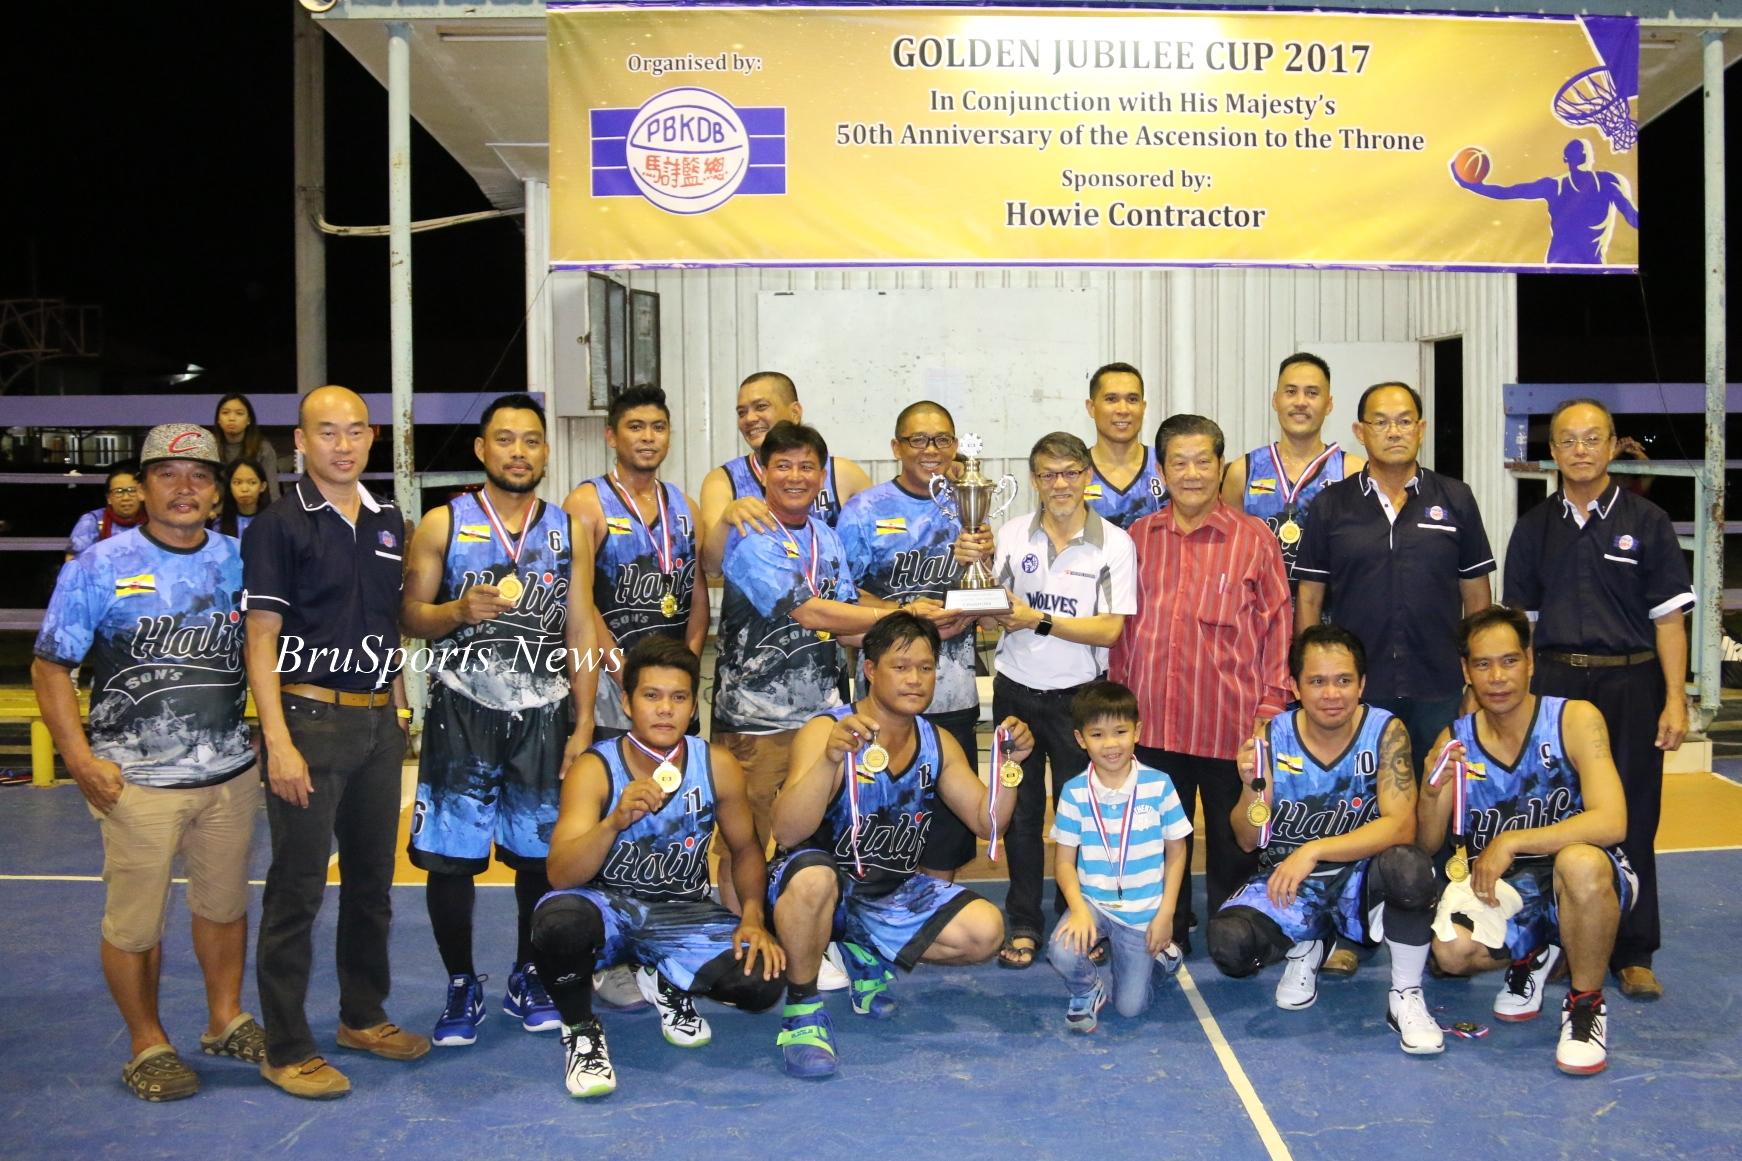 Halif & Sons win Golden Jubilee Cup 2017 title